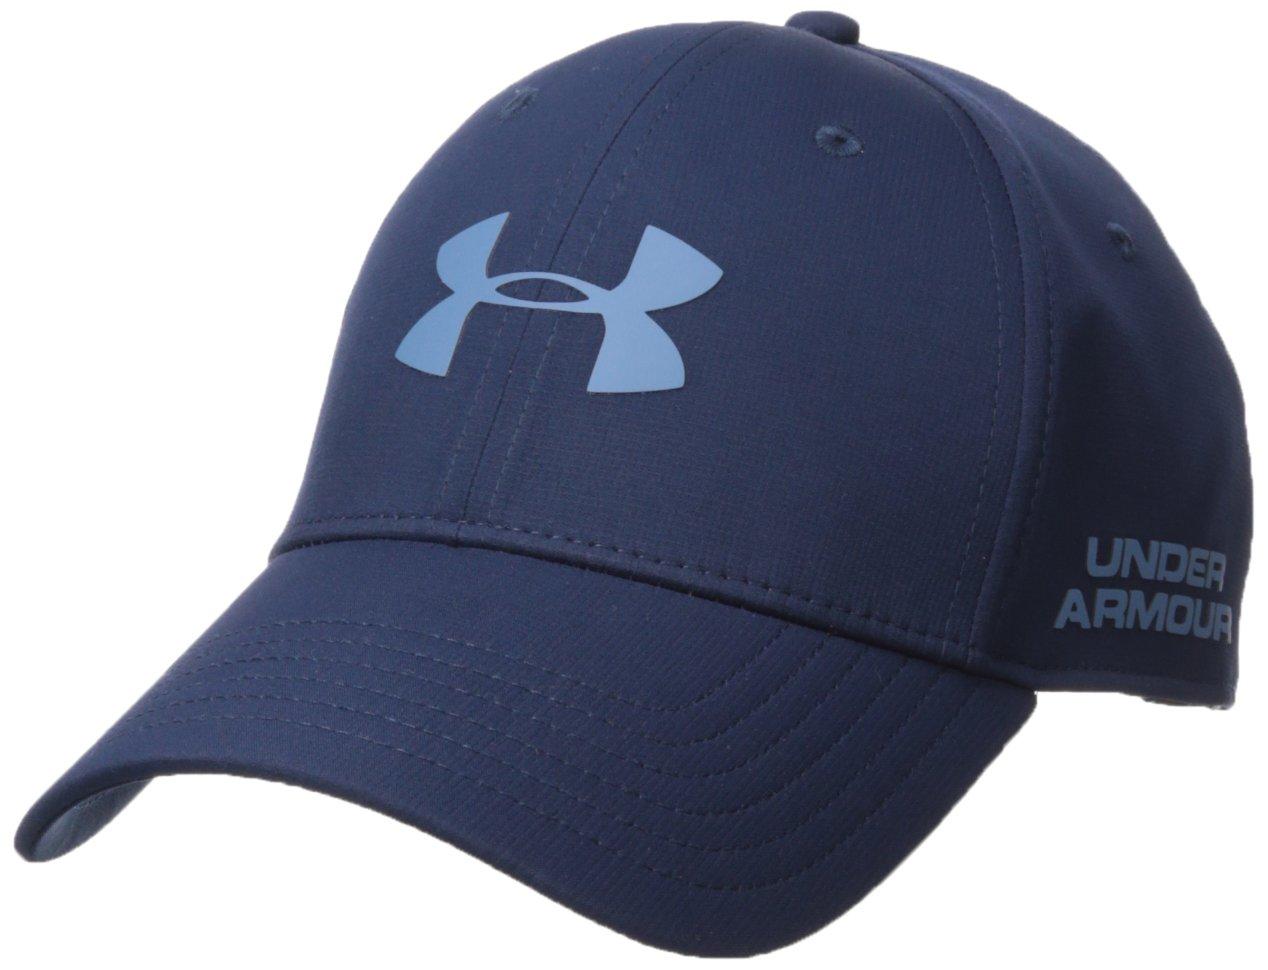 Under ArmourメンズゴルフHeadline 2.0キャップ B072FJ68GX Large/X-Large|Academy (408)/Bass Blue Academy (408)/Bass Blue Large/XLarge